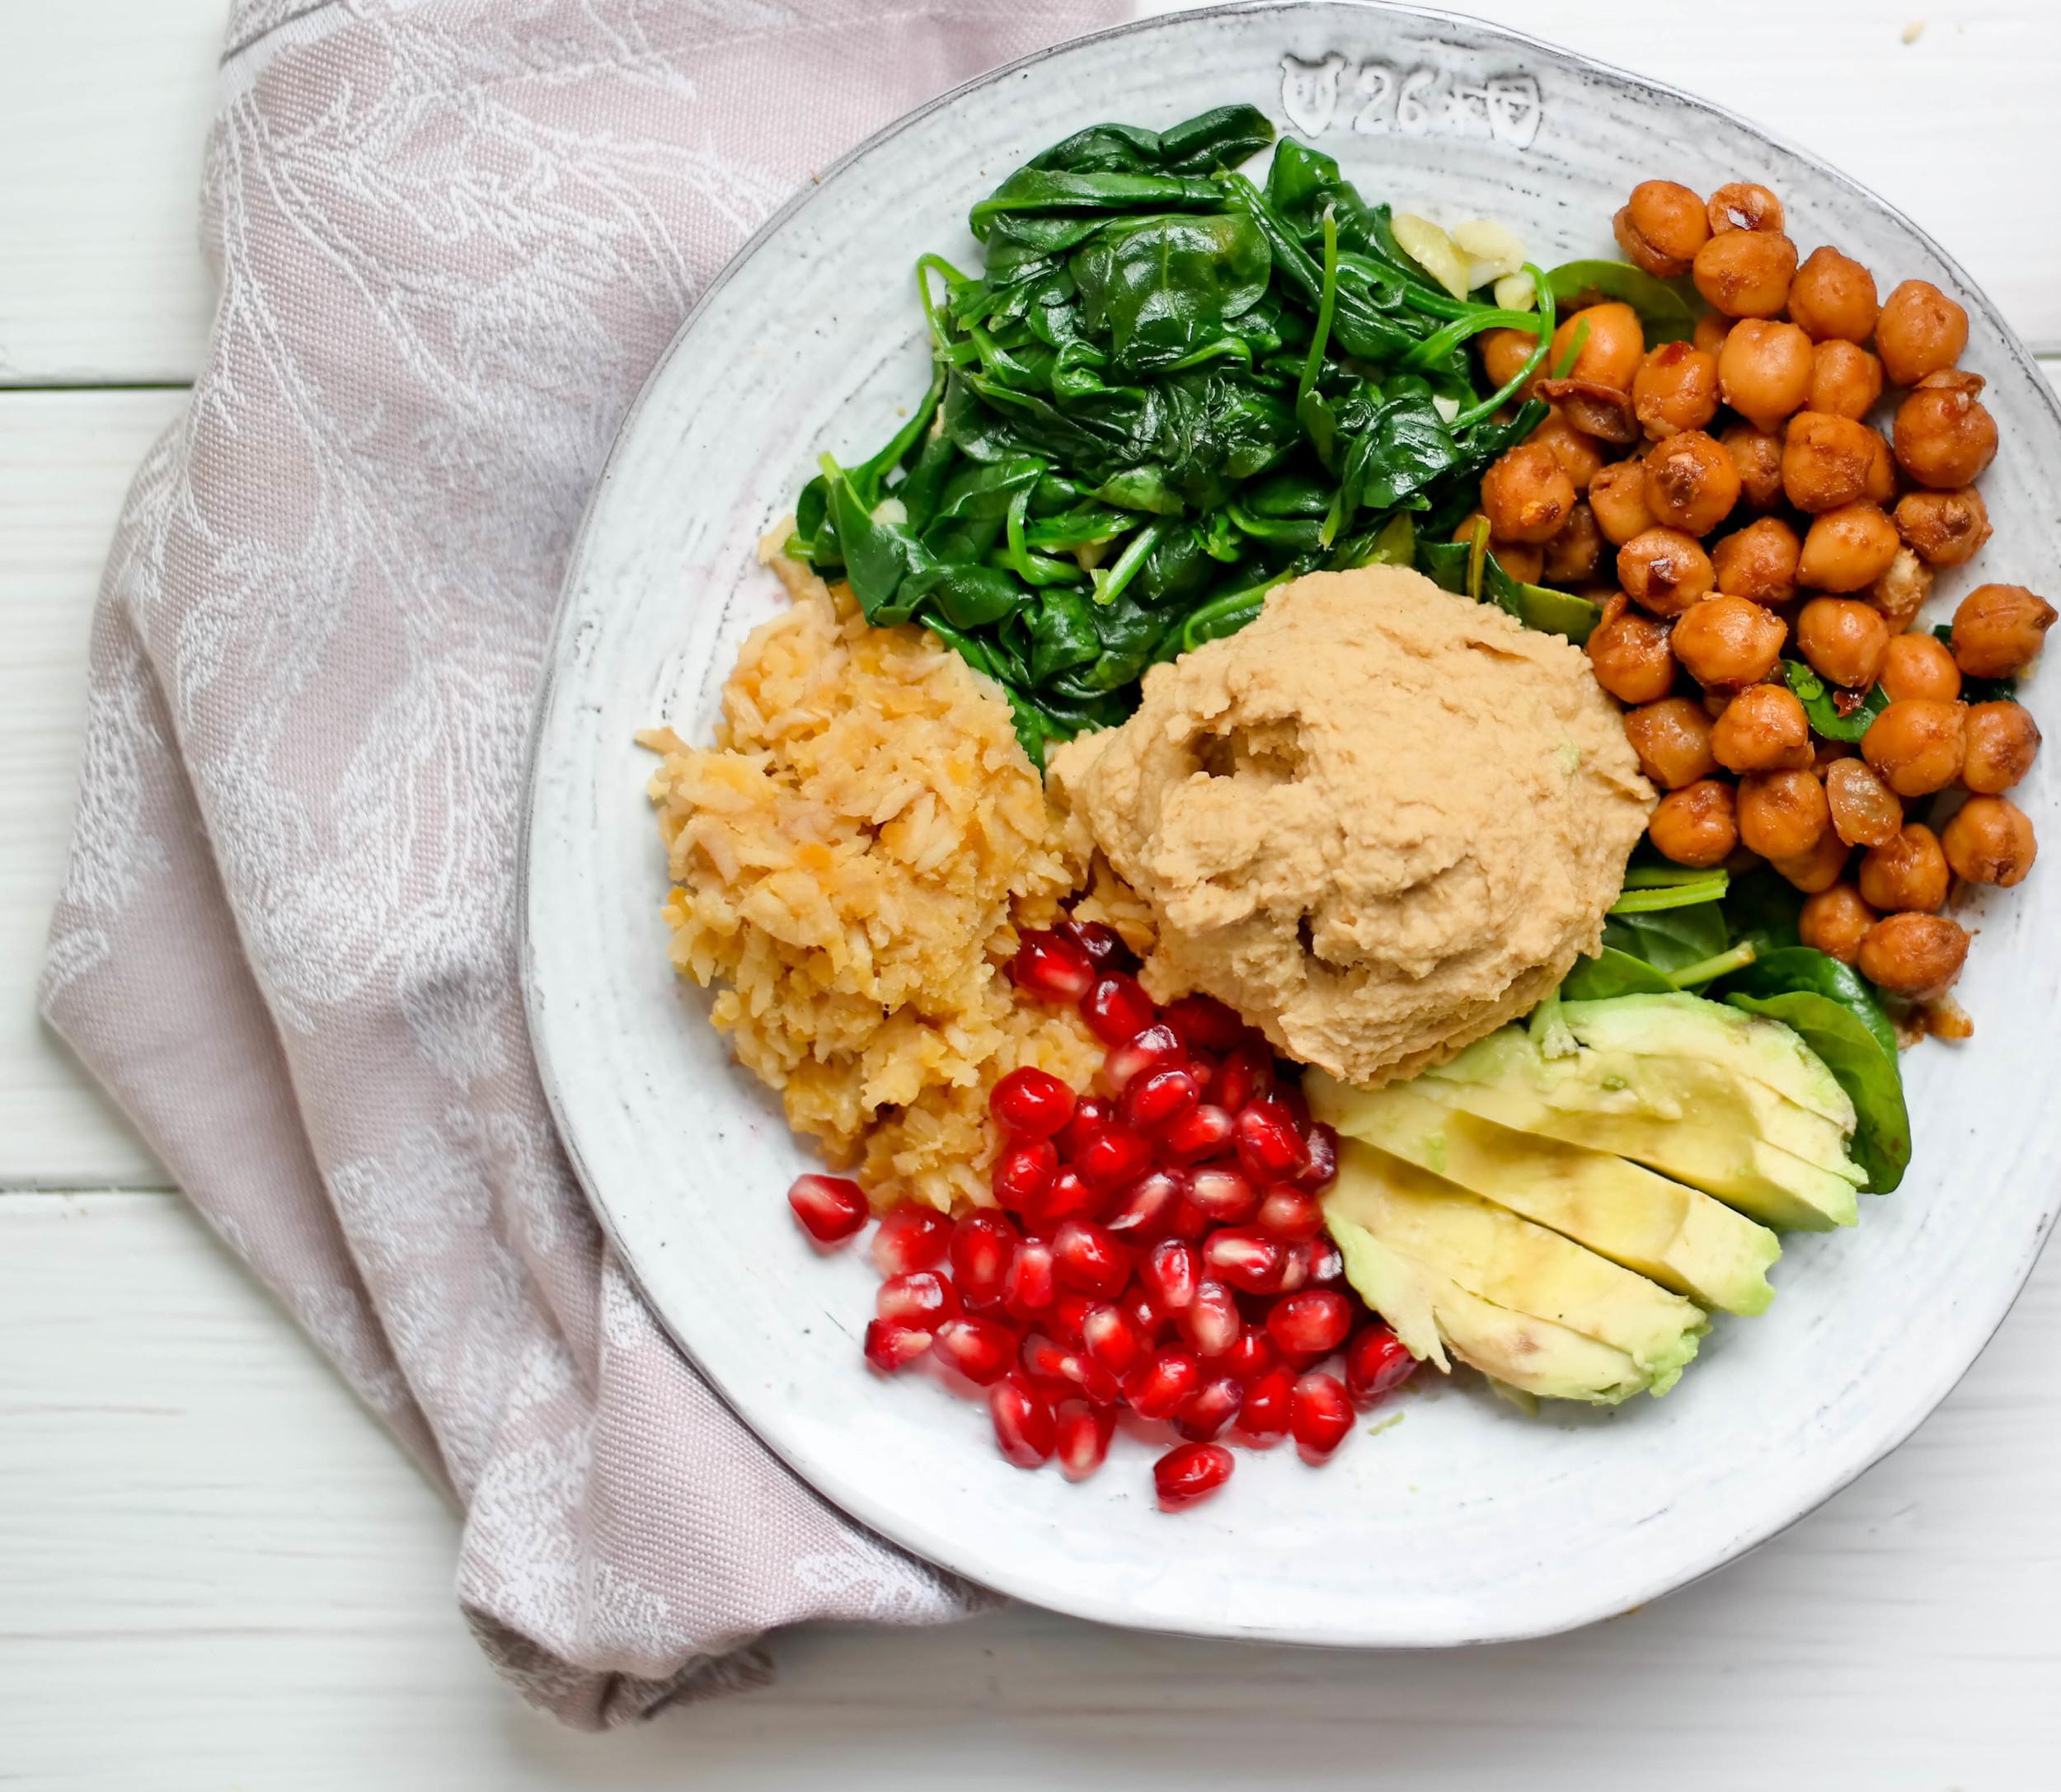 2-The-Best-Rainbow-Salad | www.8thandlake.com